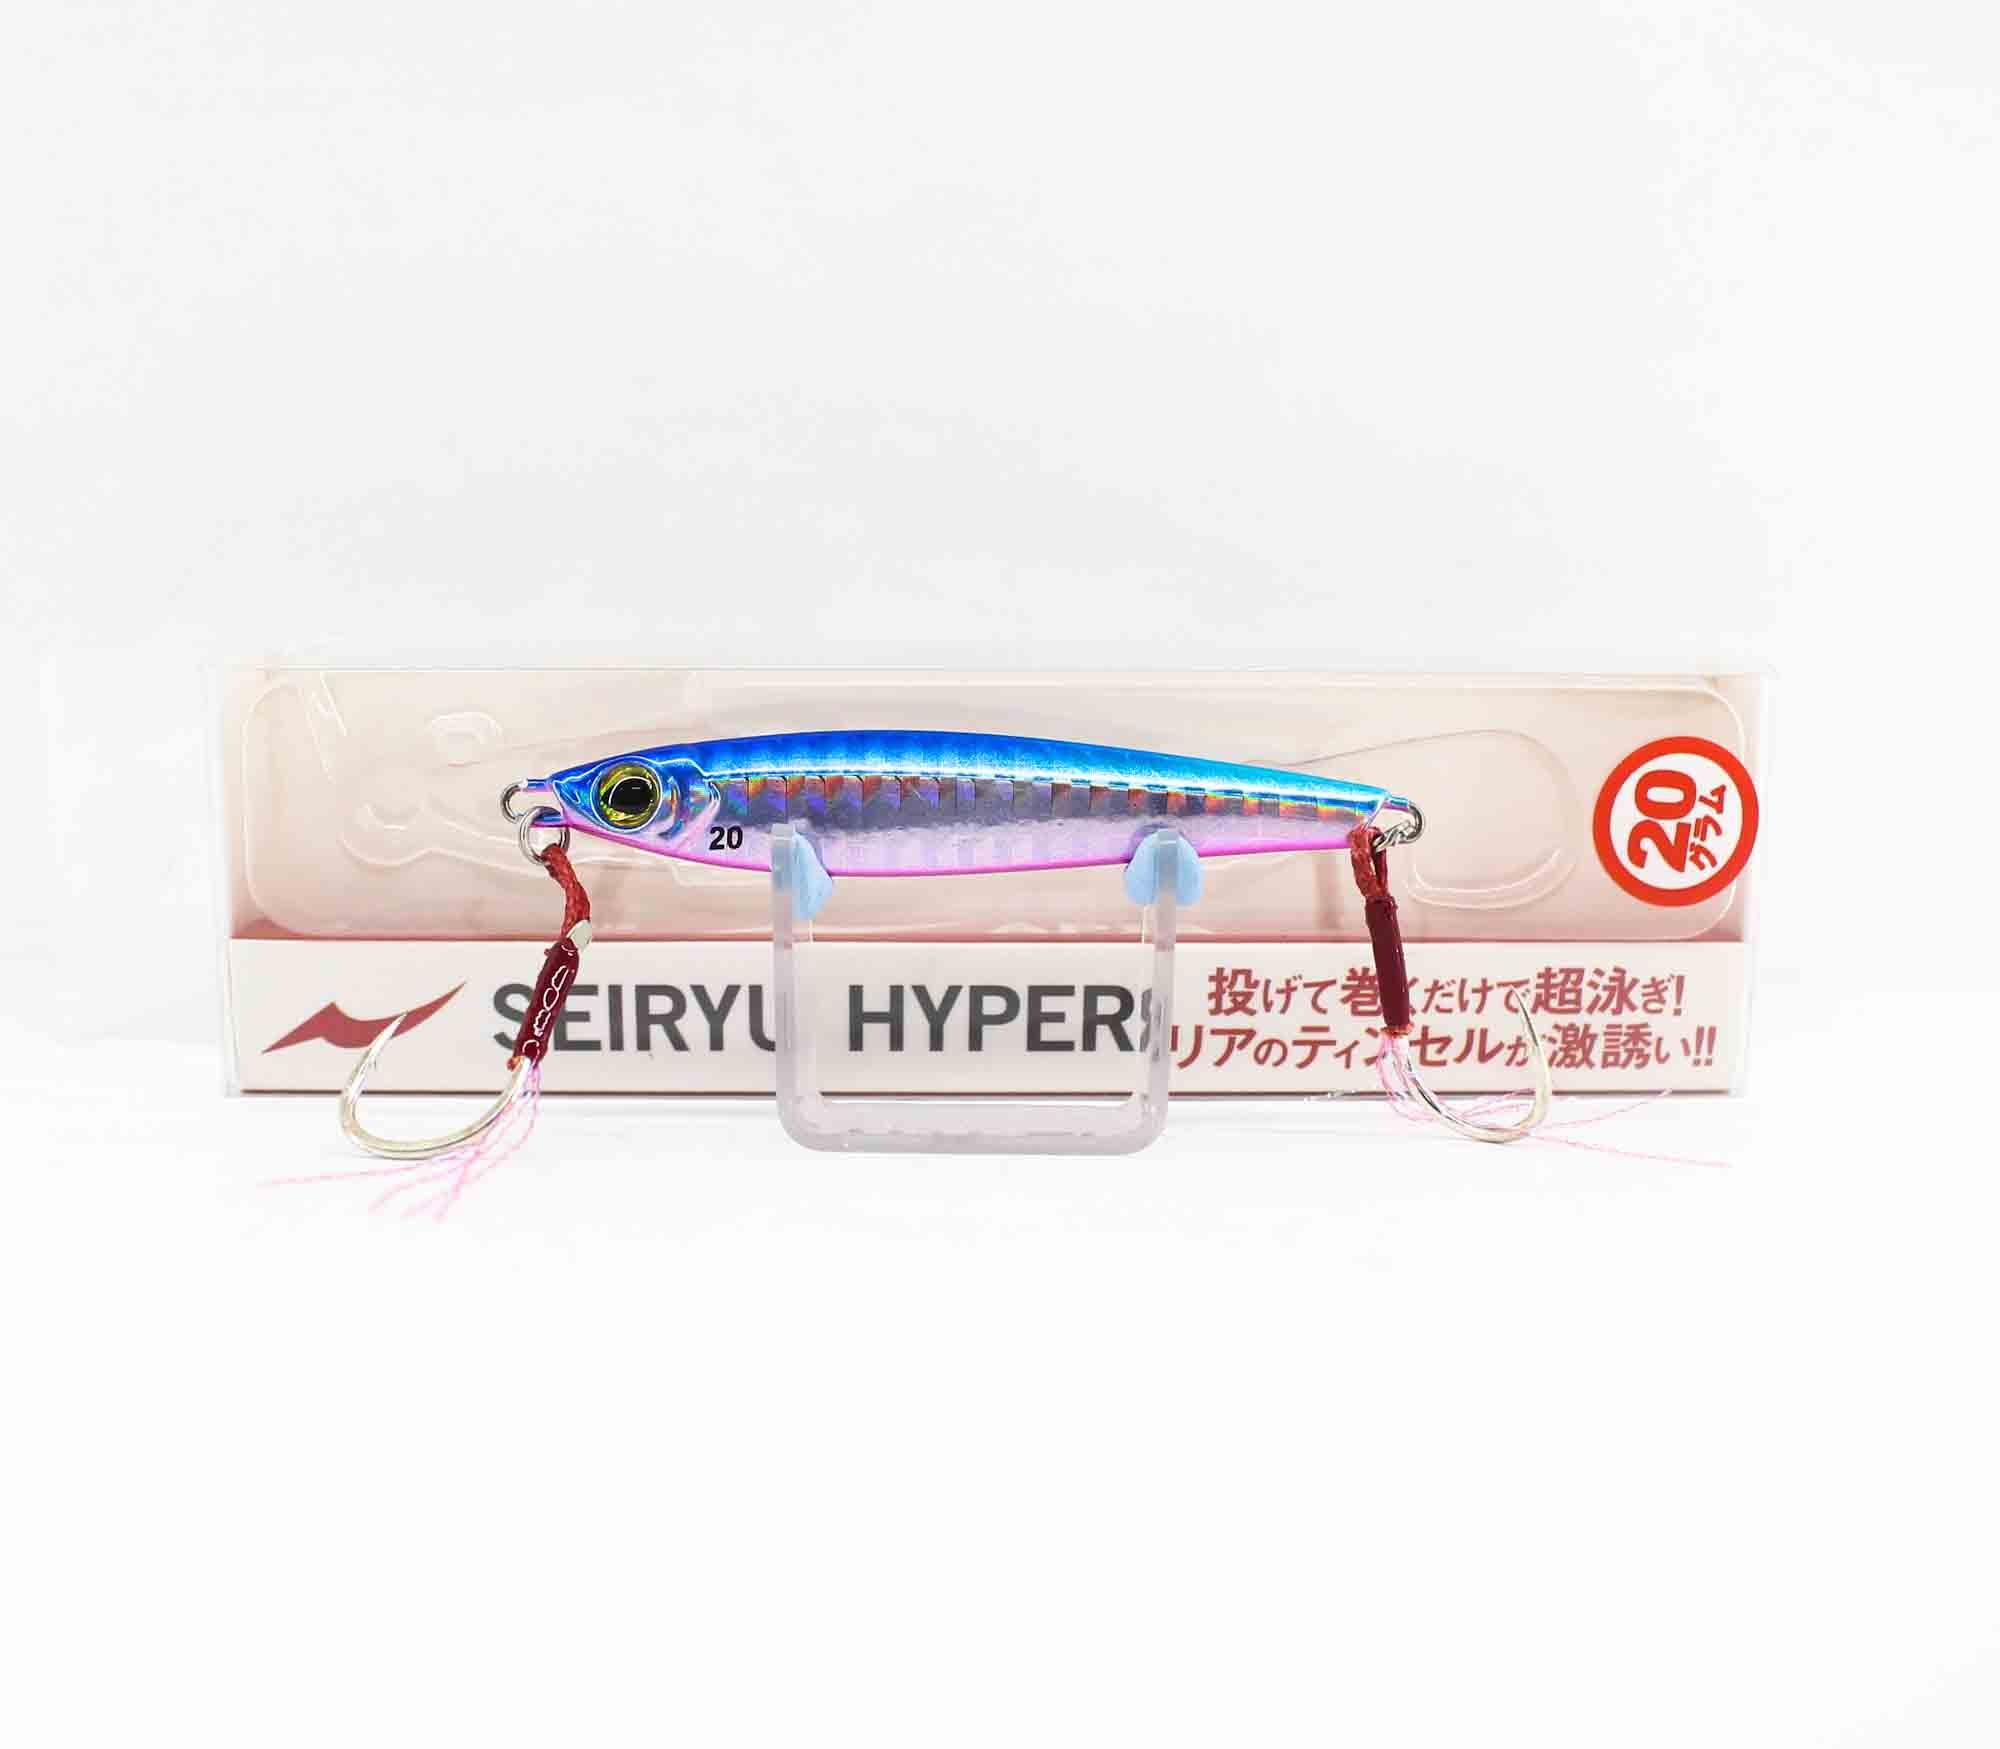 Apia Metal Jig Seiryu Hyper 20 Grams Sinking Lure 07 (2465)